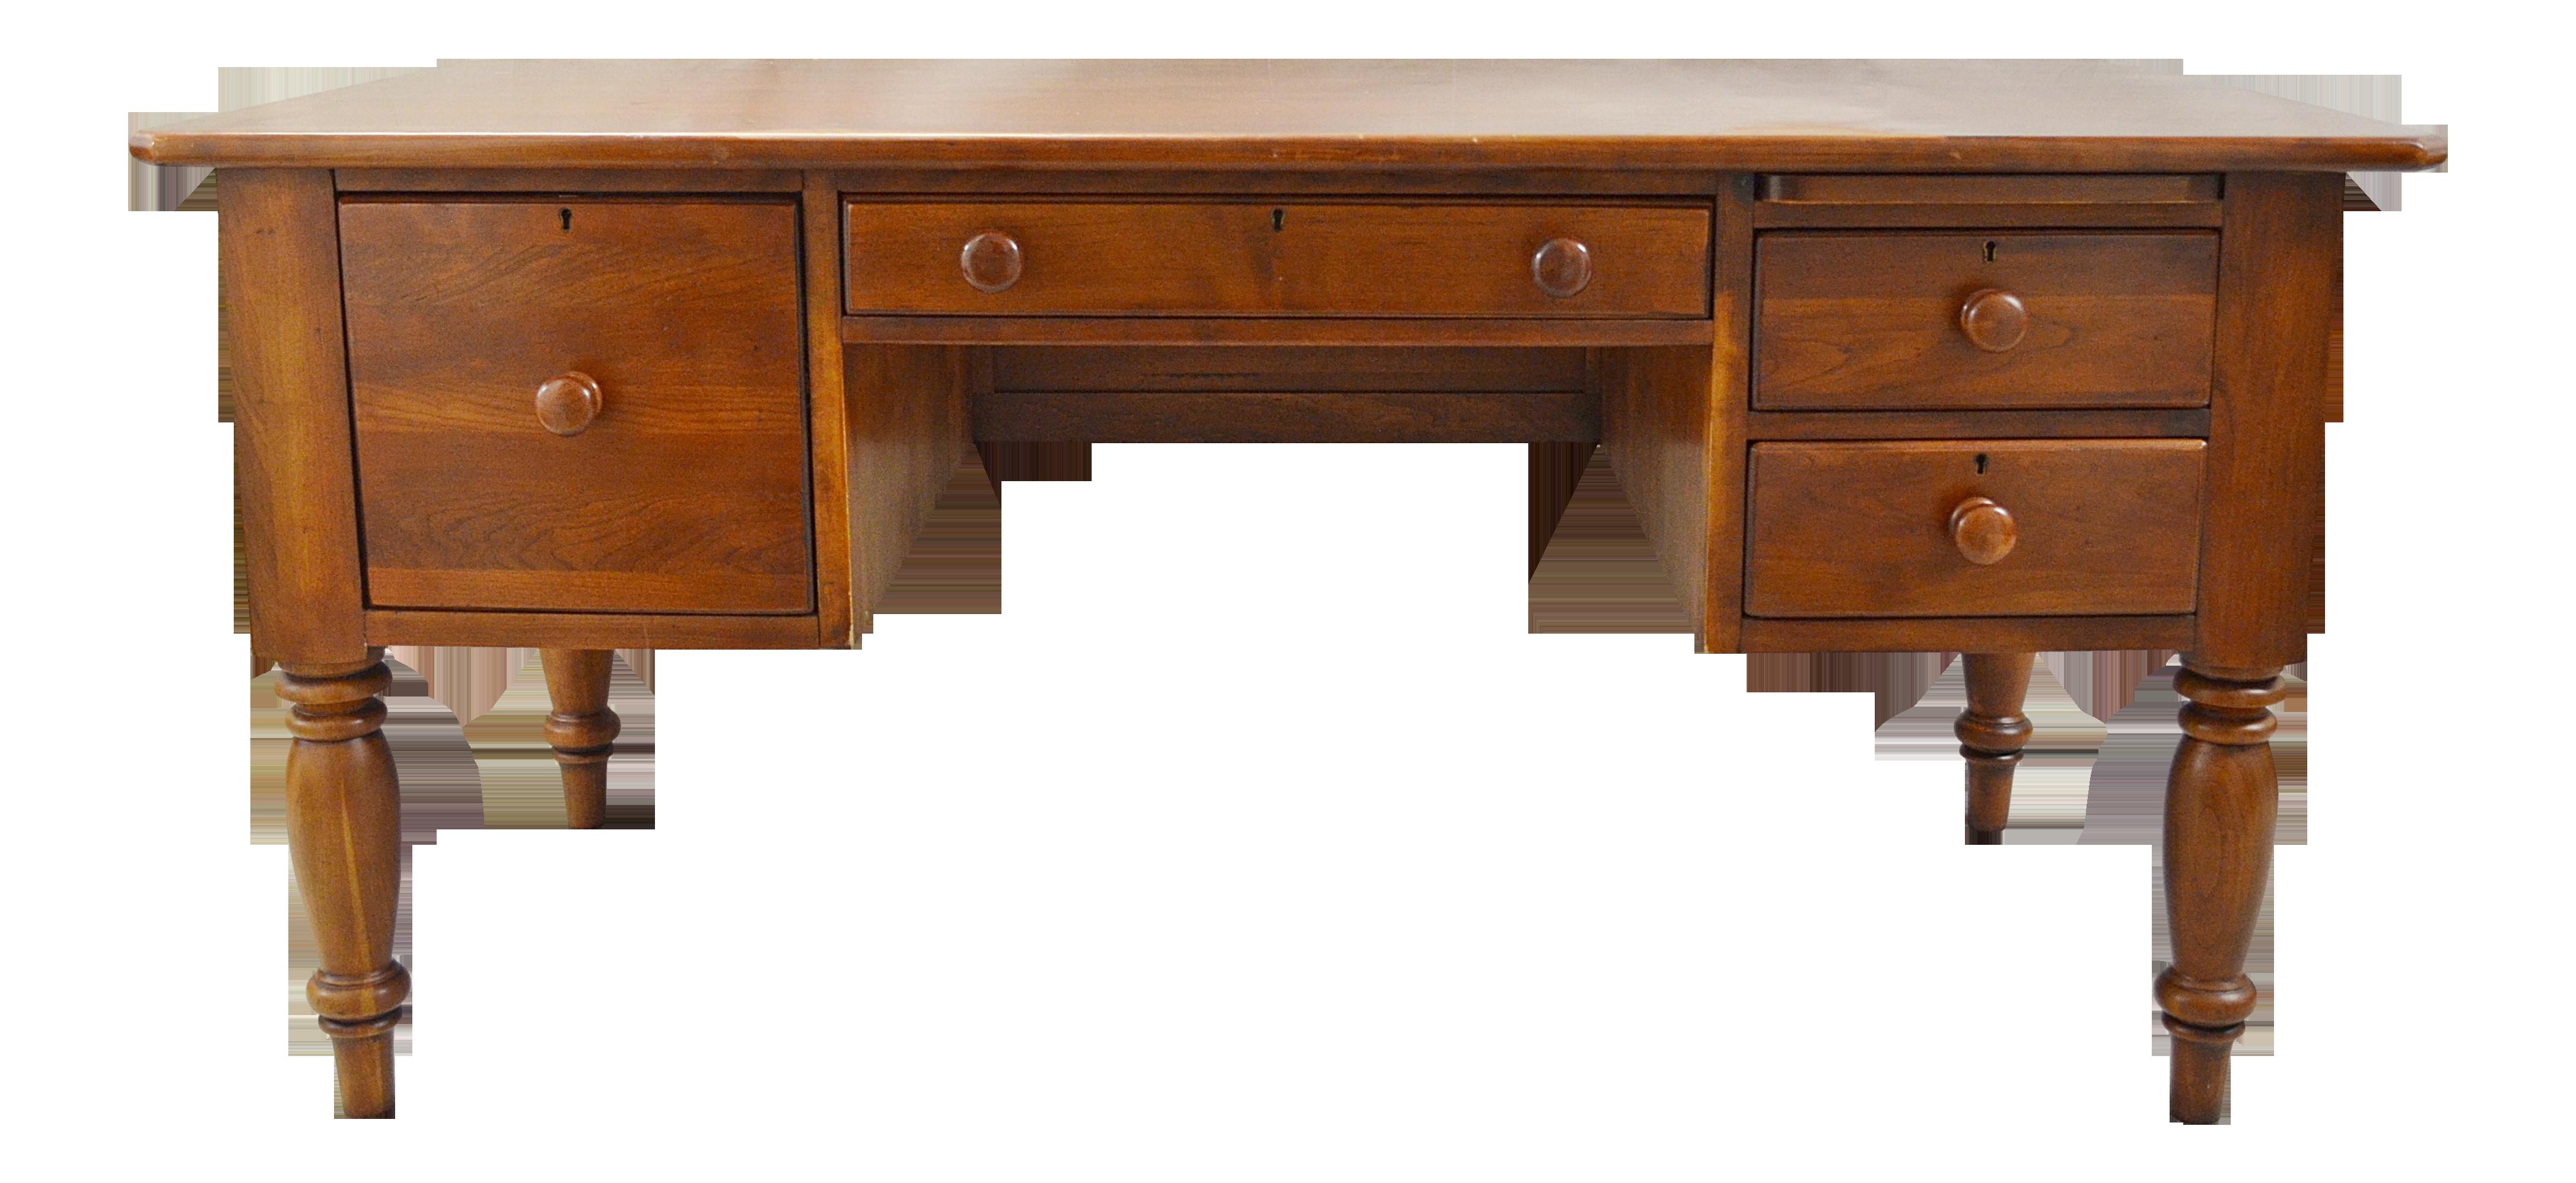 Bob Timberlake Desk Chairish